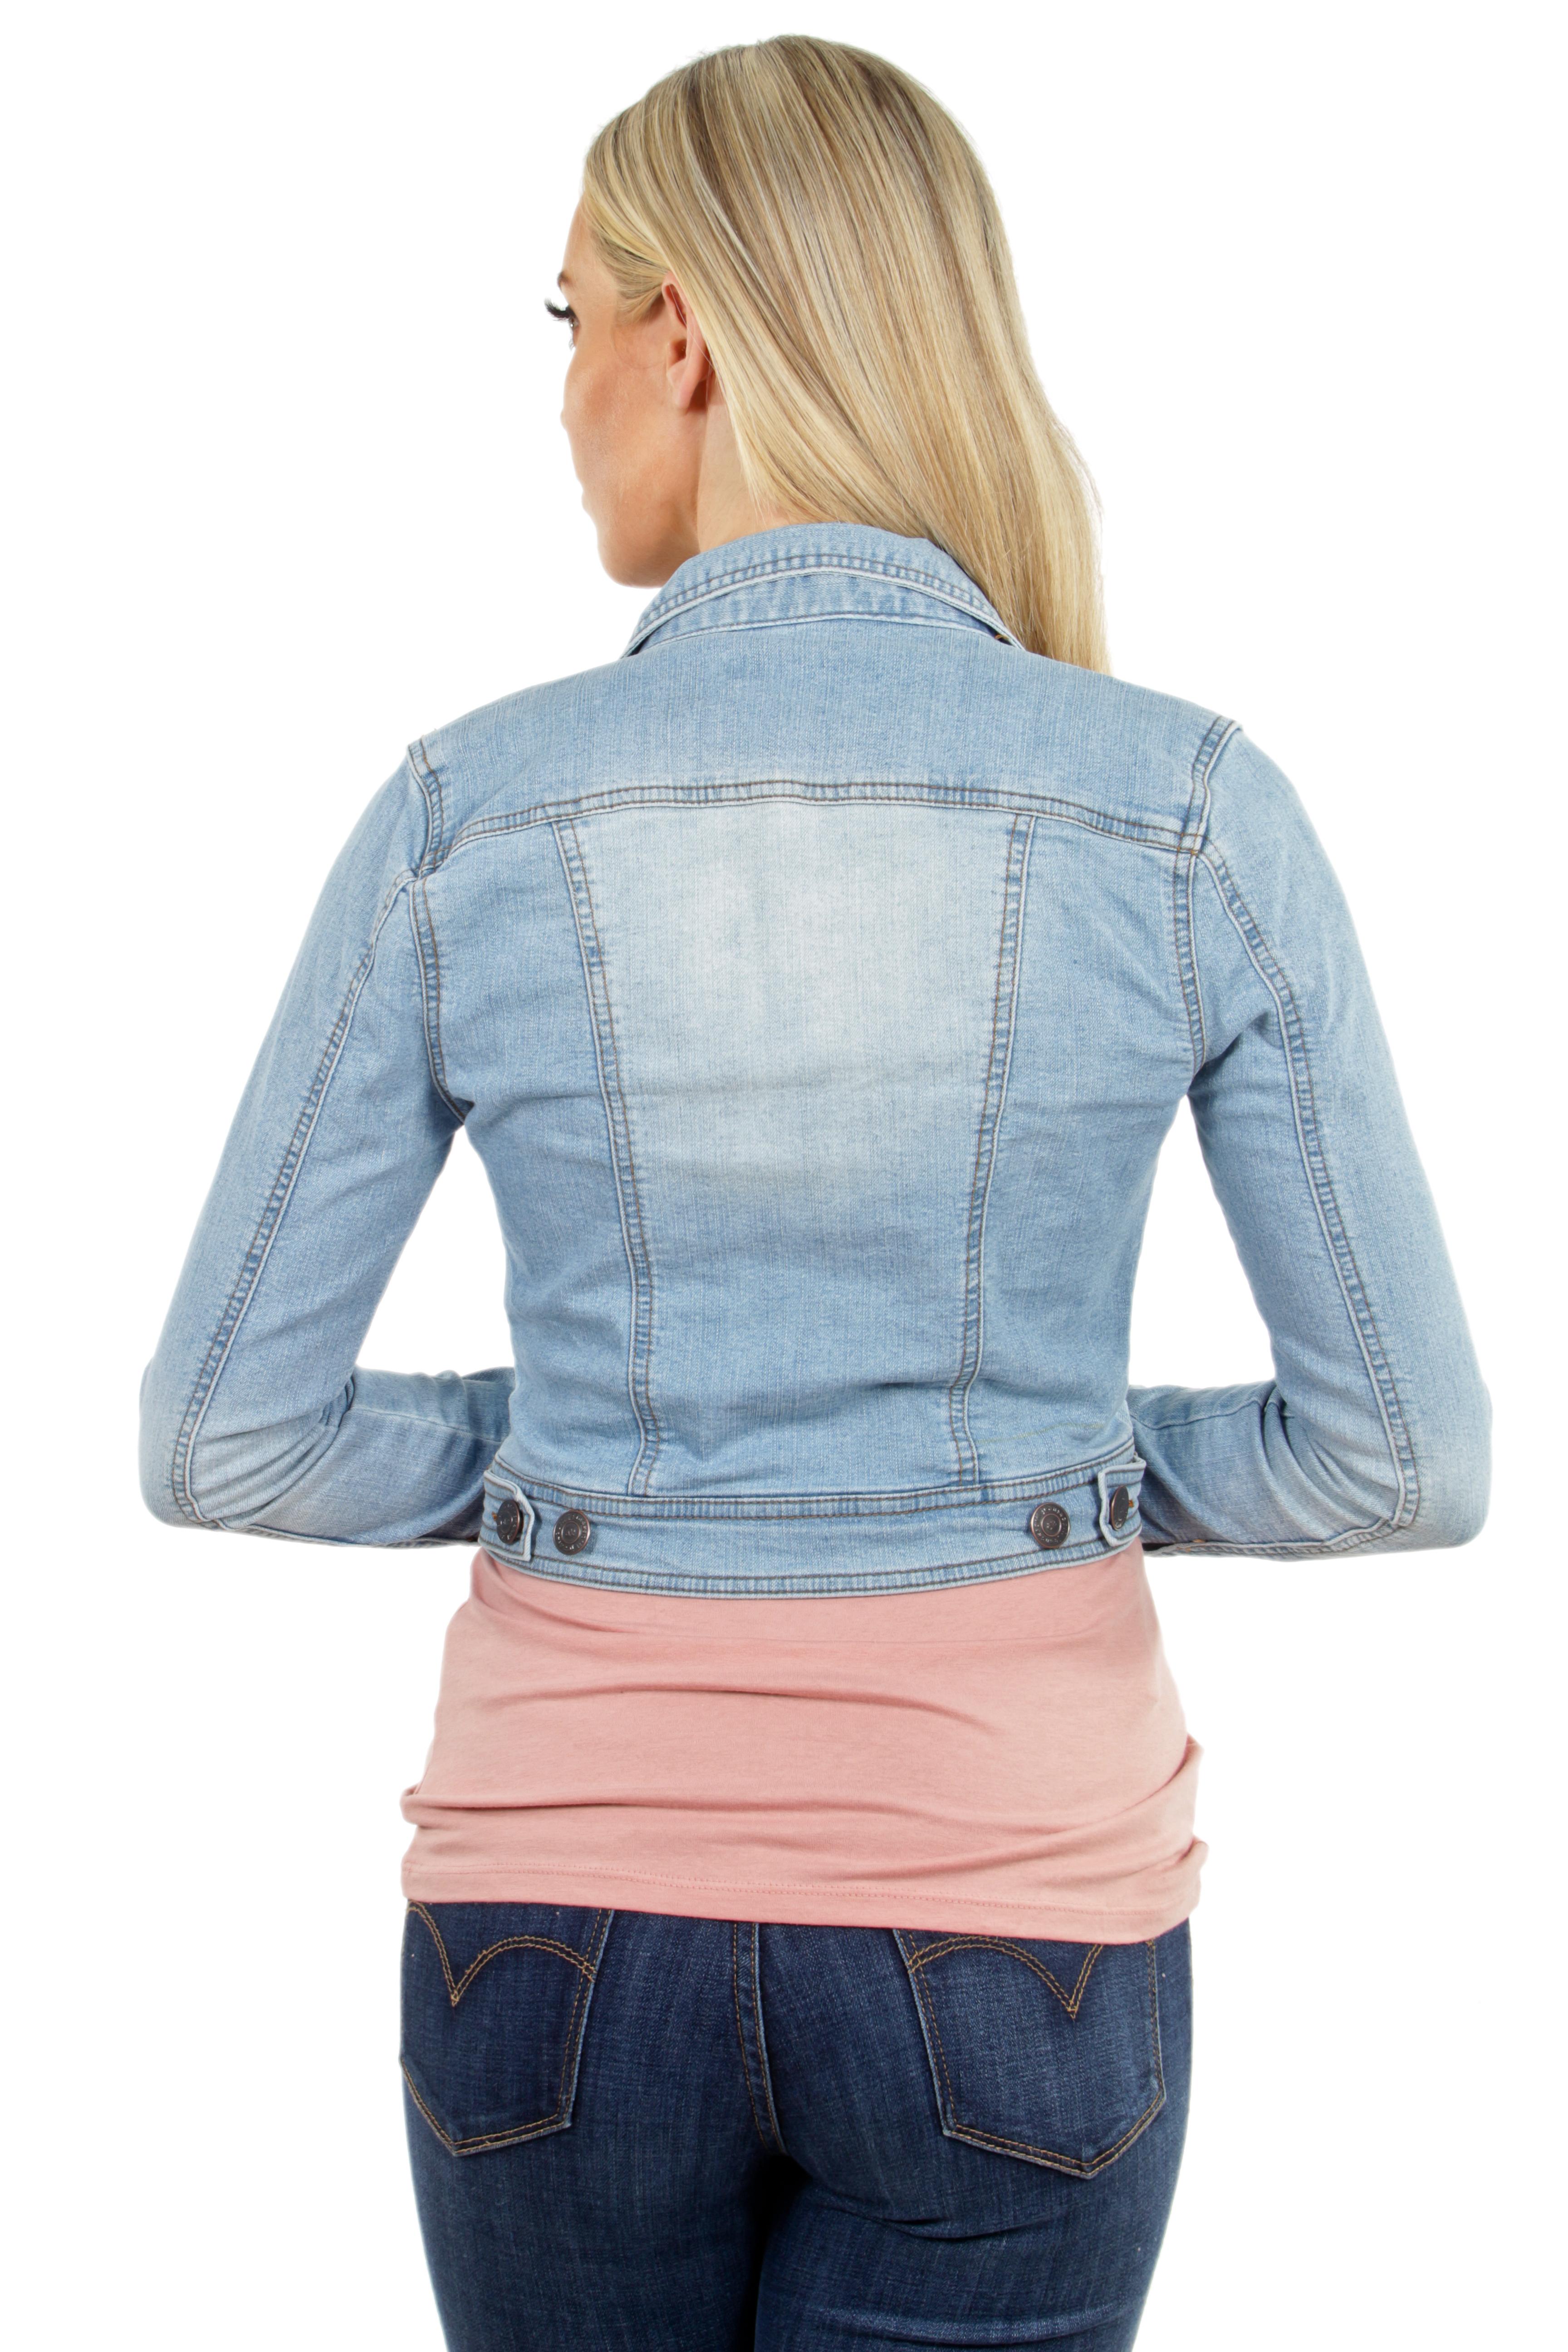 Women-039-s-Juniors-Premium-Stretch-Denim-Long-Sleeve-Jacket thumbnail 7